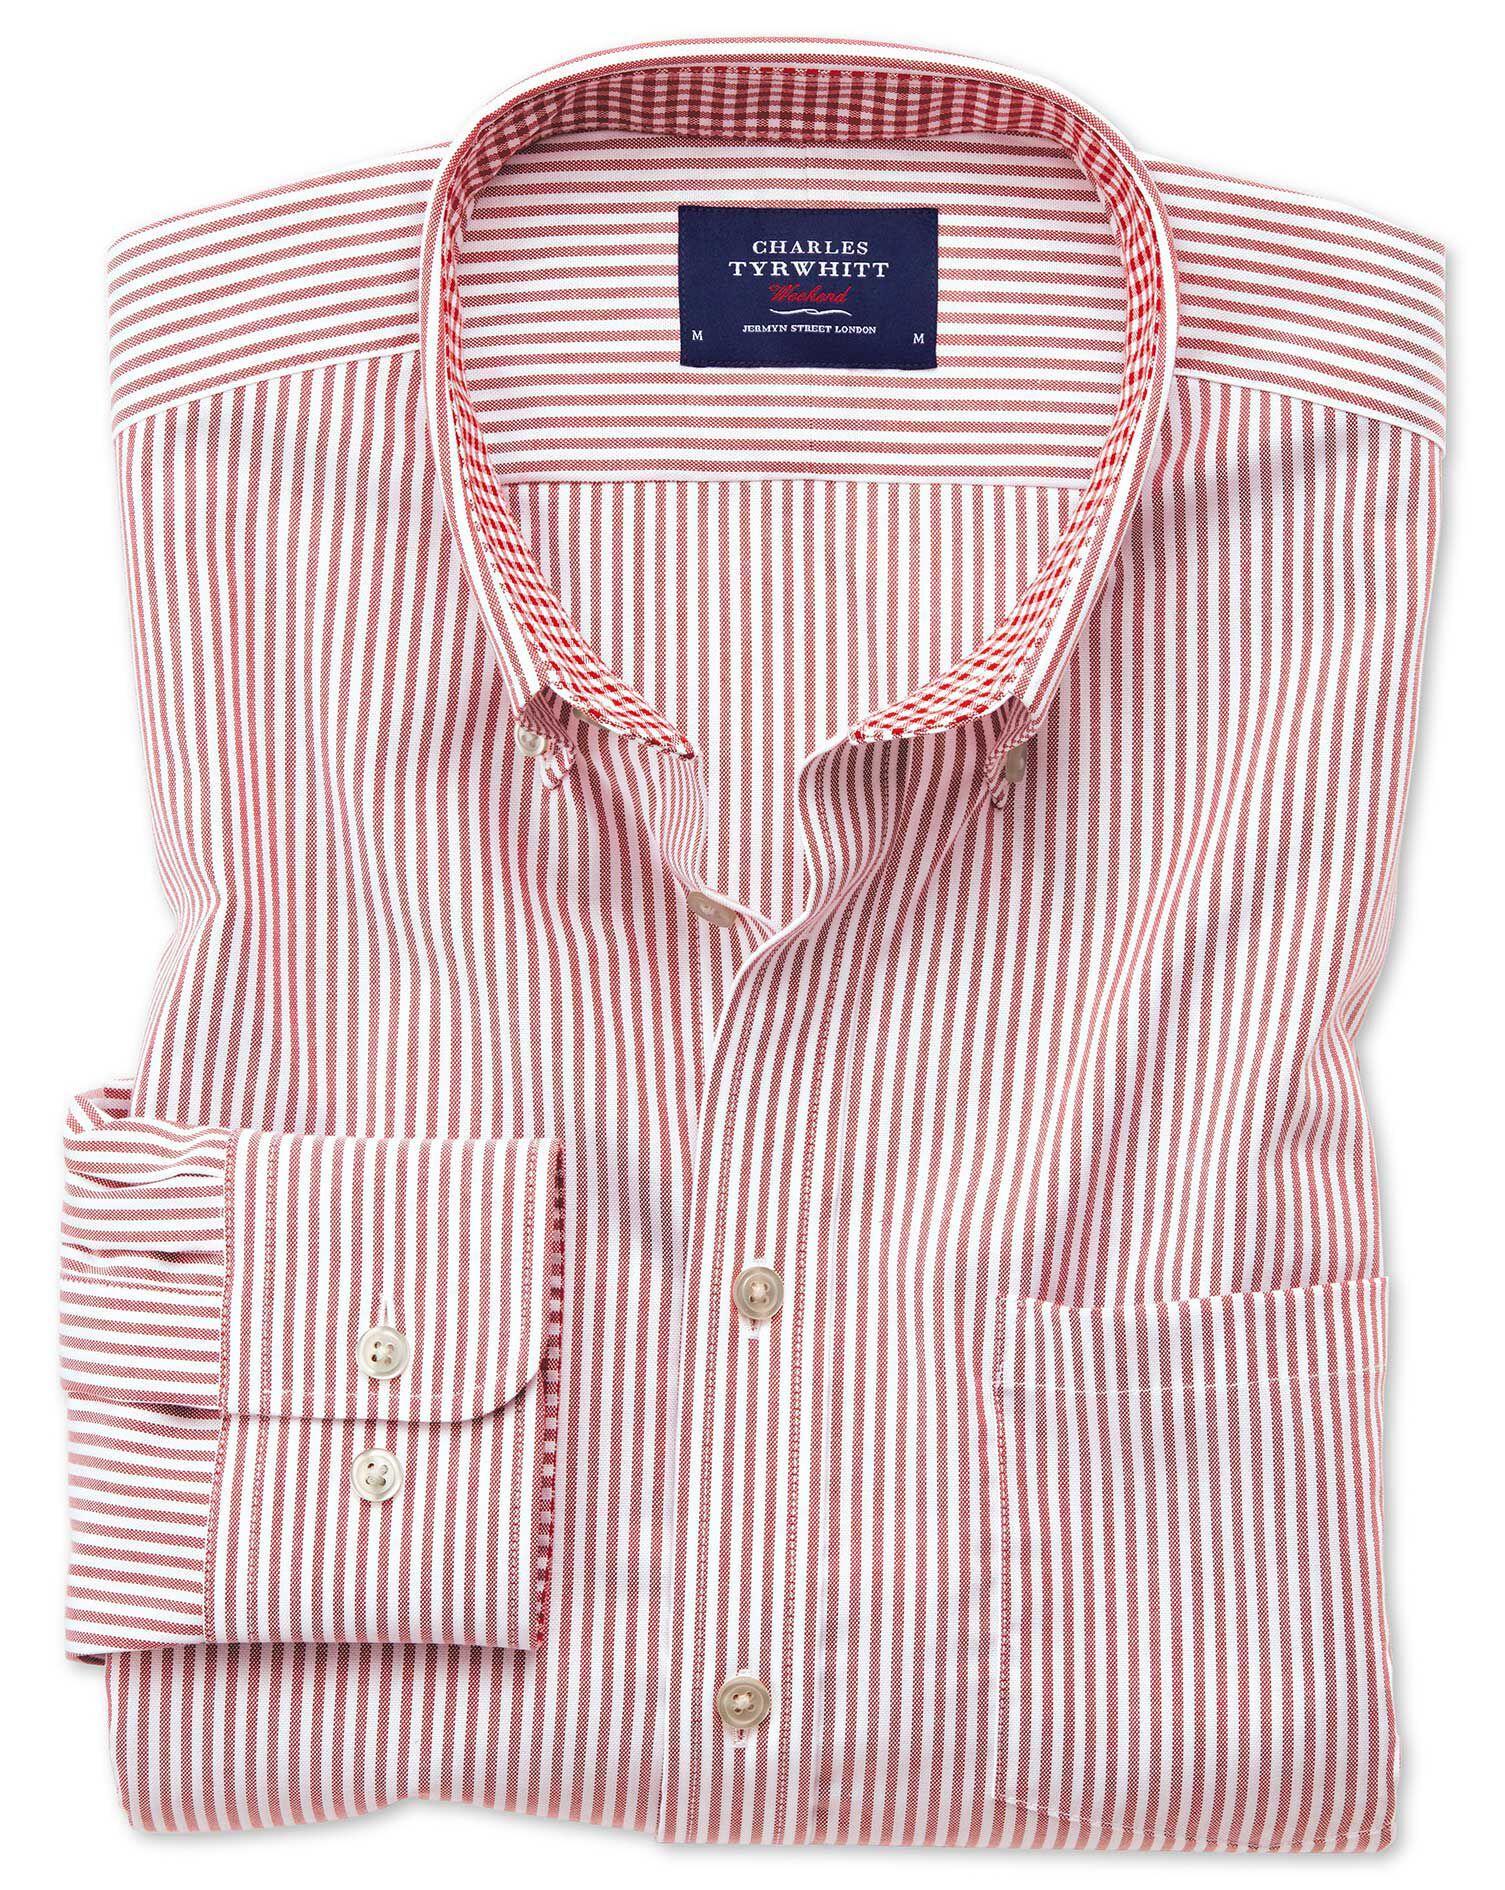 Extra Slim Fit Button-Down Non-Iron Oxford Bengal Stripe Rust Cotton Shirt Single Cuff Size Medium b